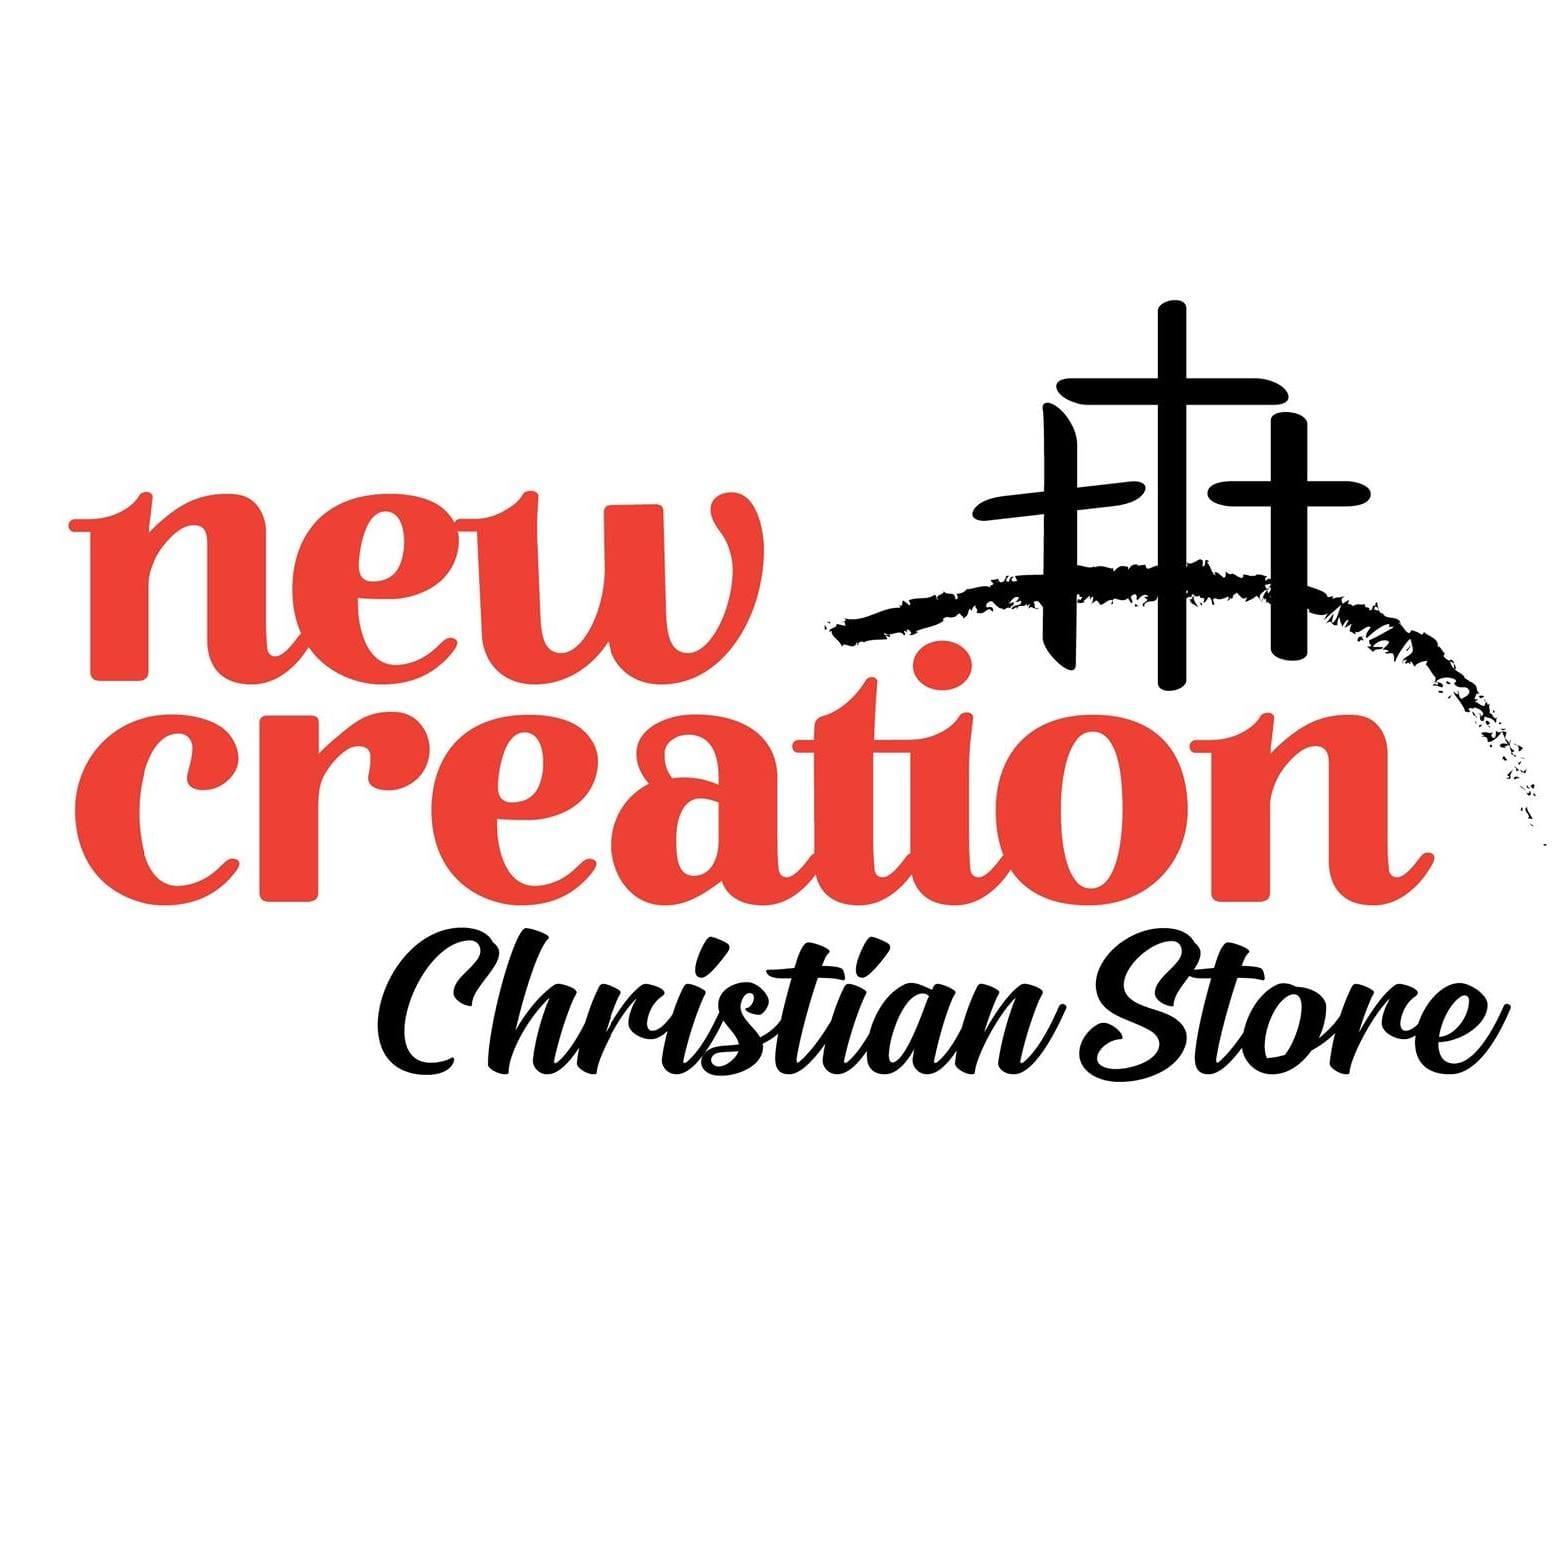 The New Creation Store TT